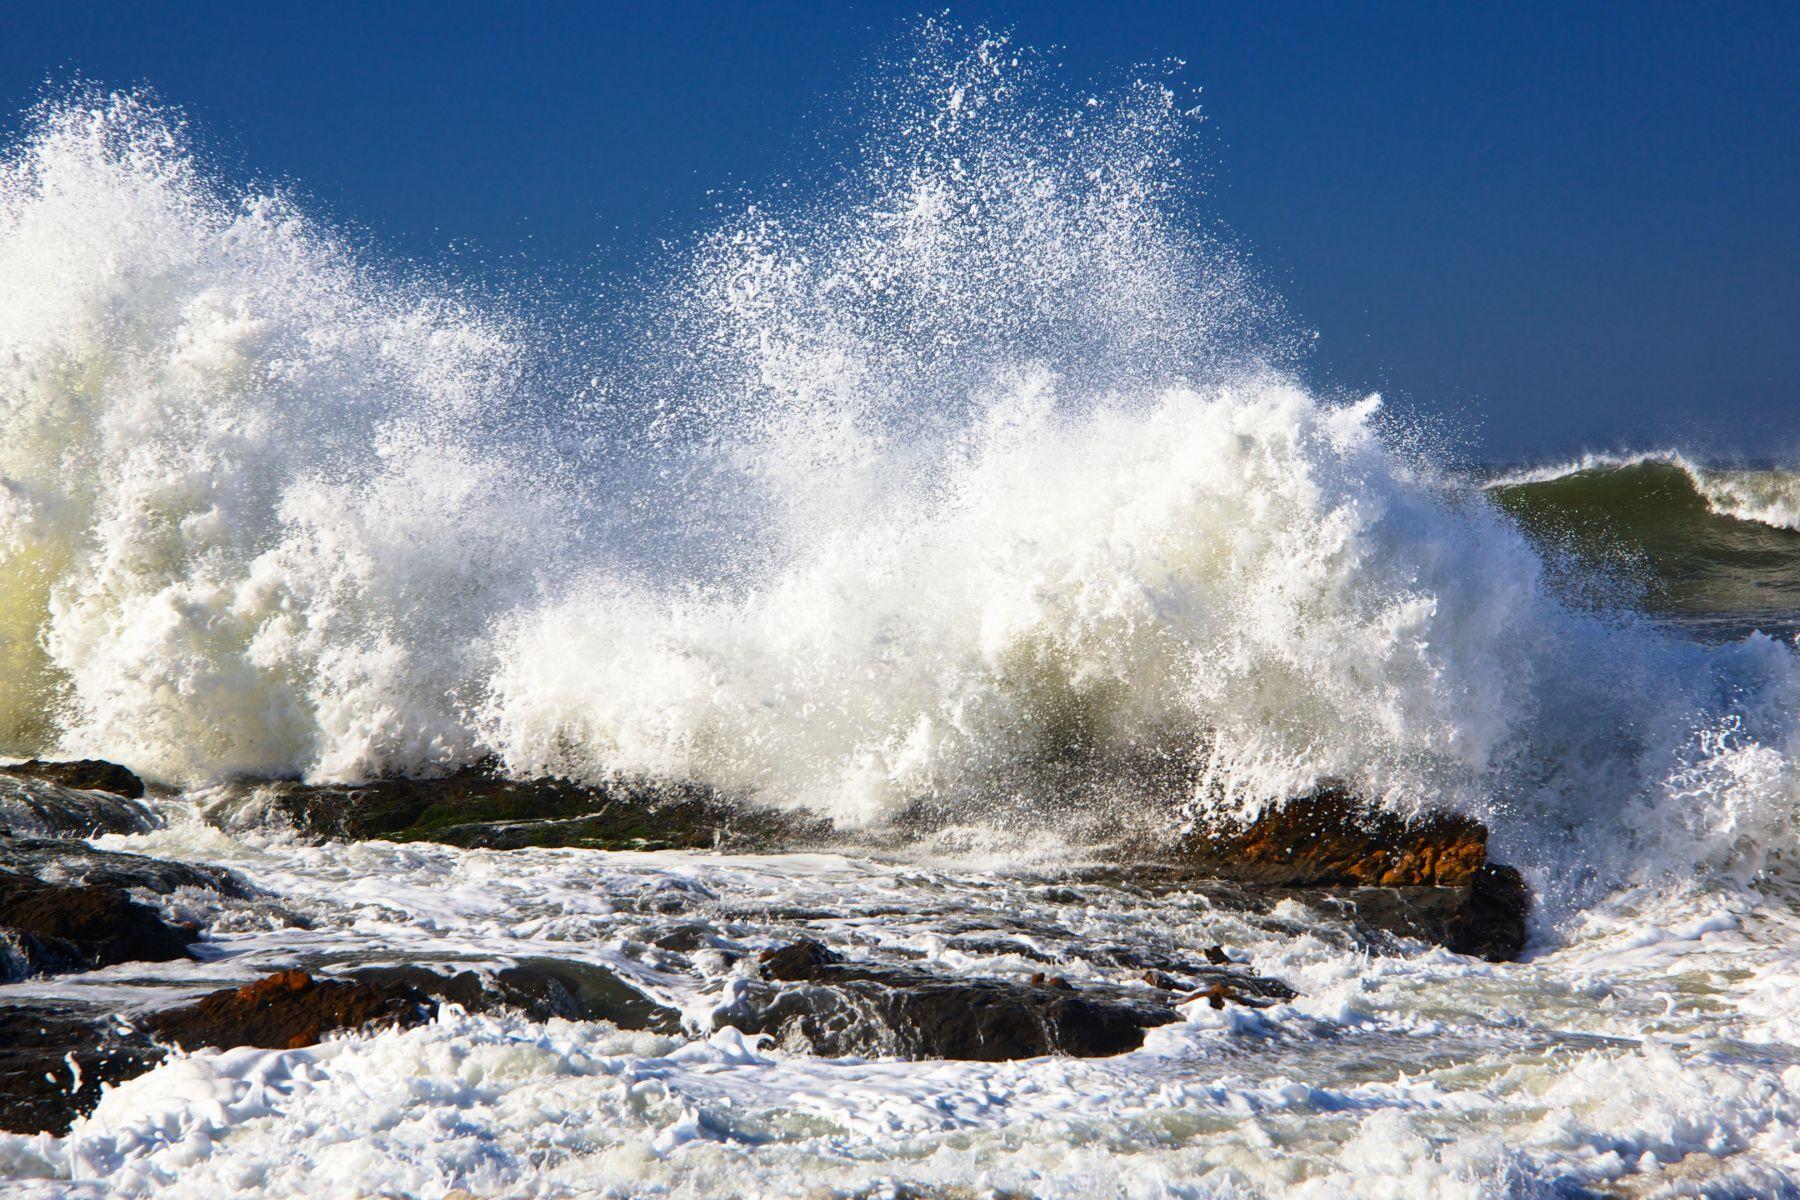 Ferocious waves